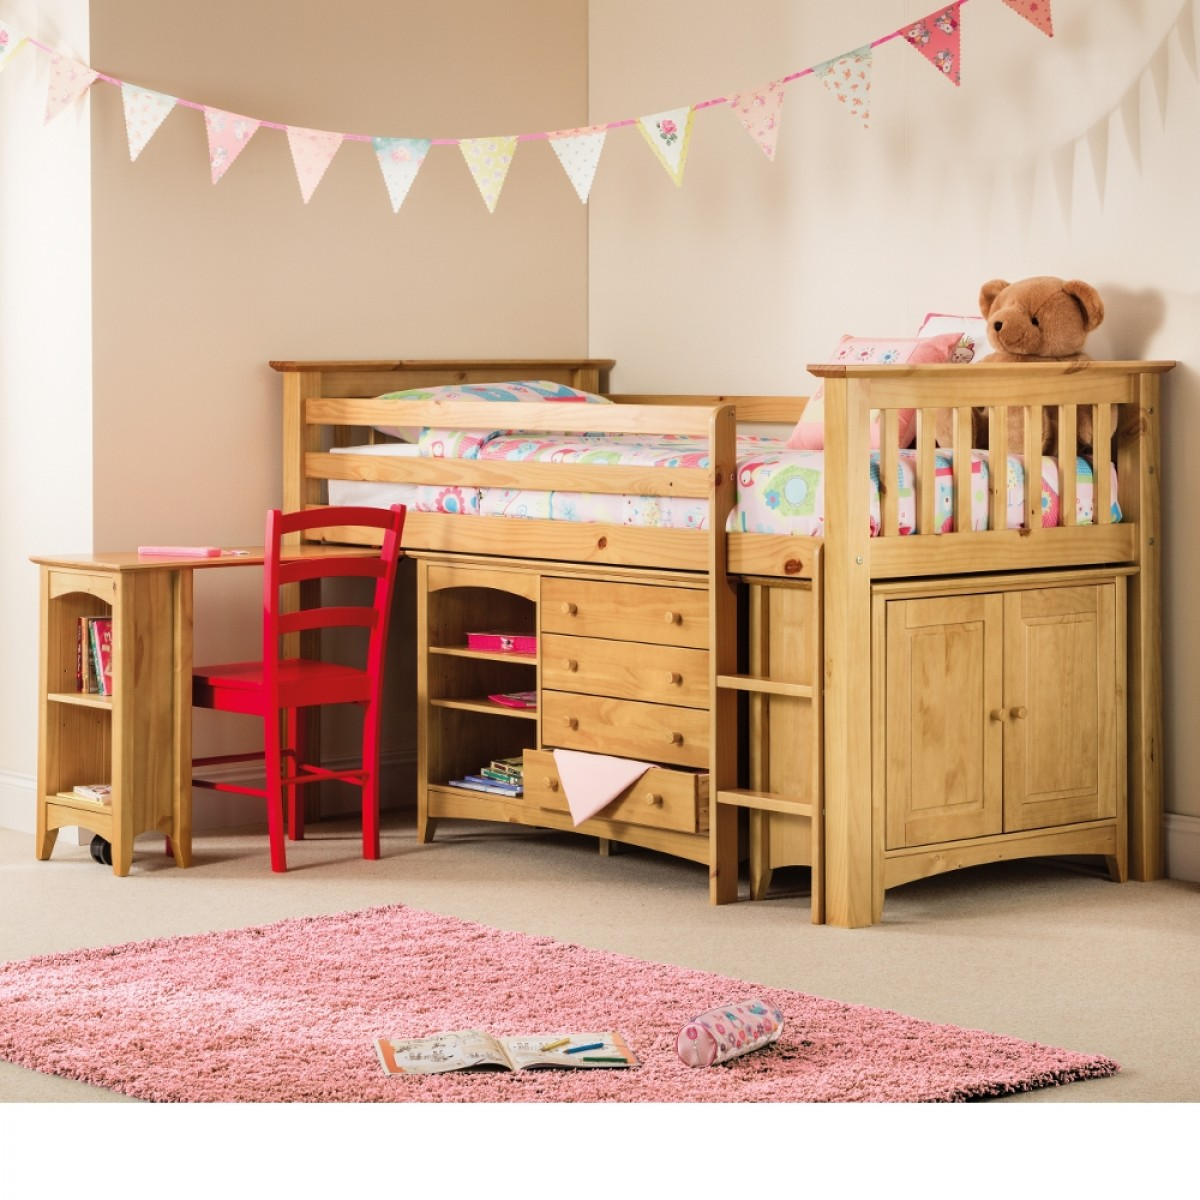 barcelona antique solid pine wooden kids mid sleeper sleep. Black Bedroom Furniture Sets. Home Design Ideas